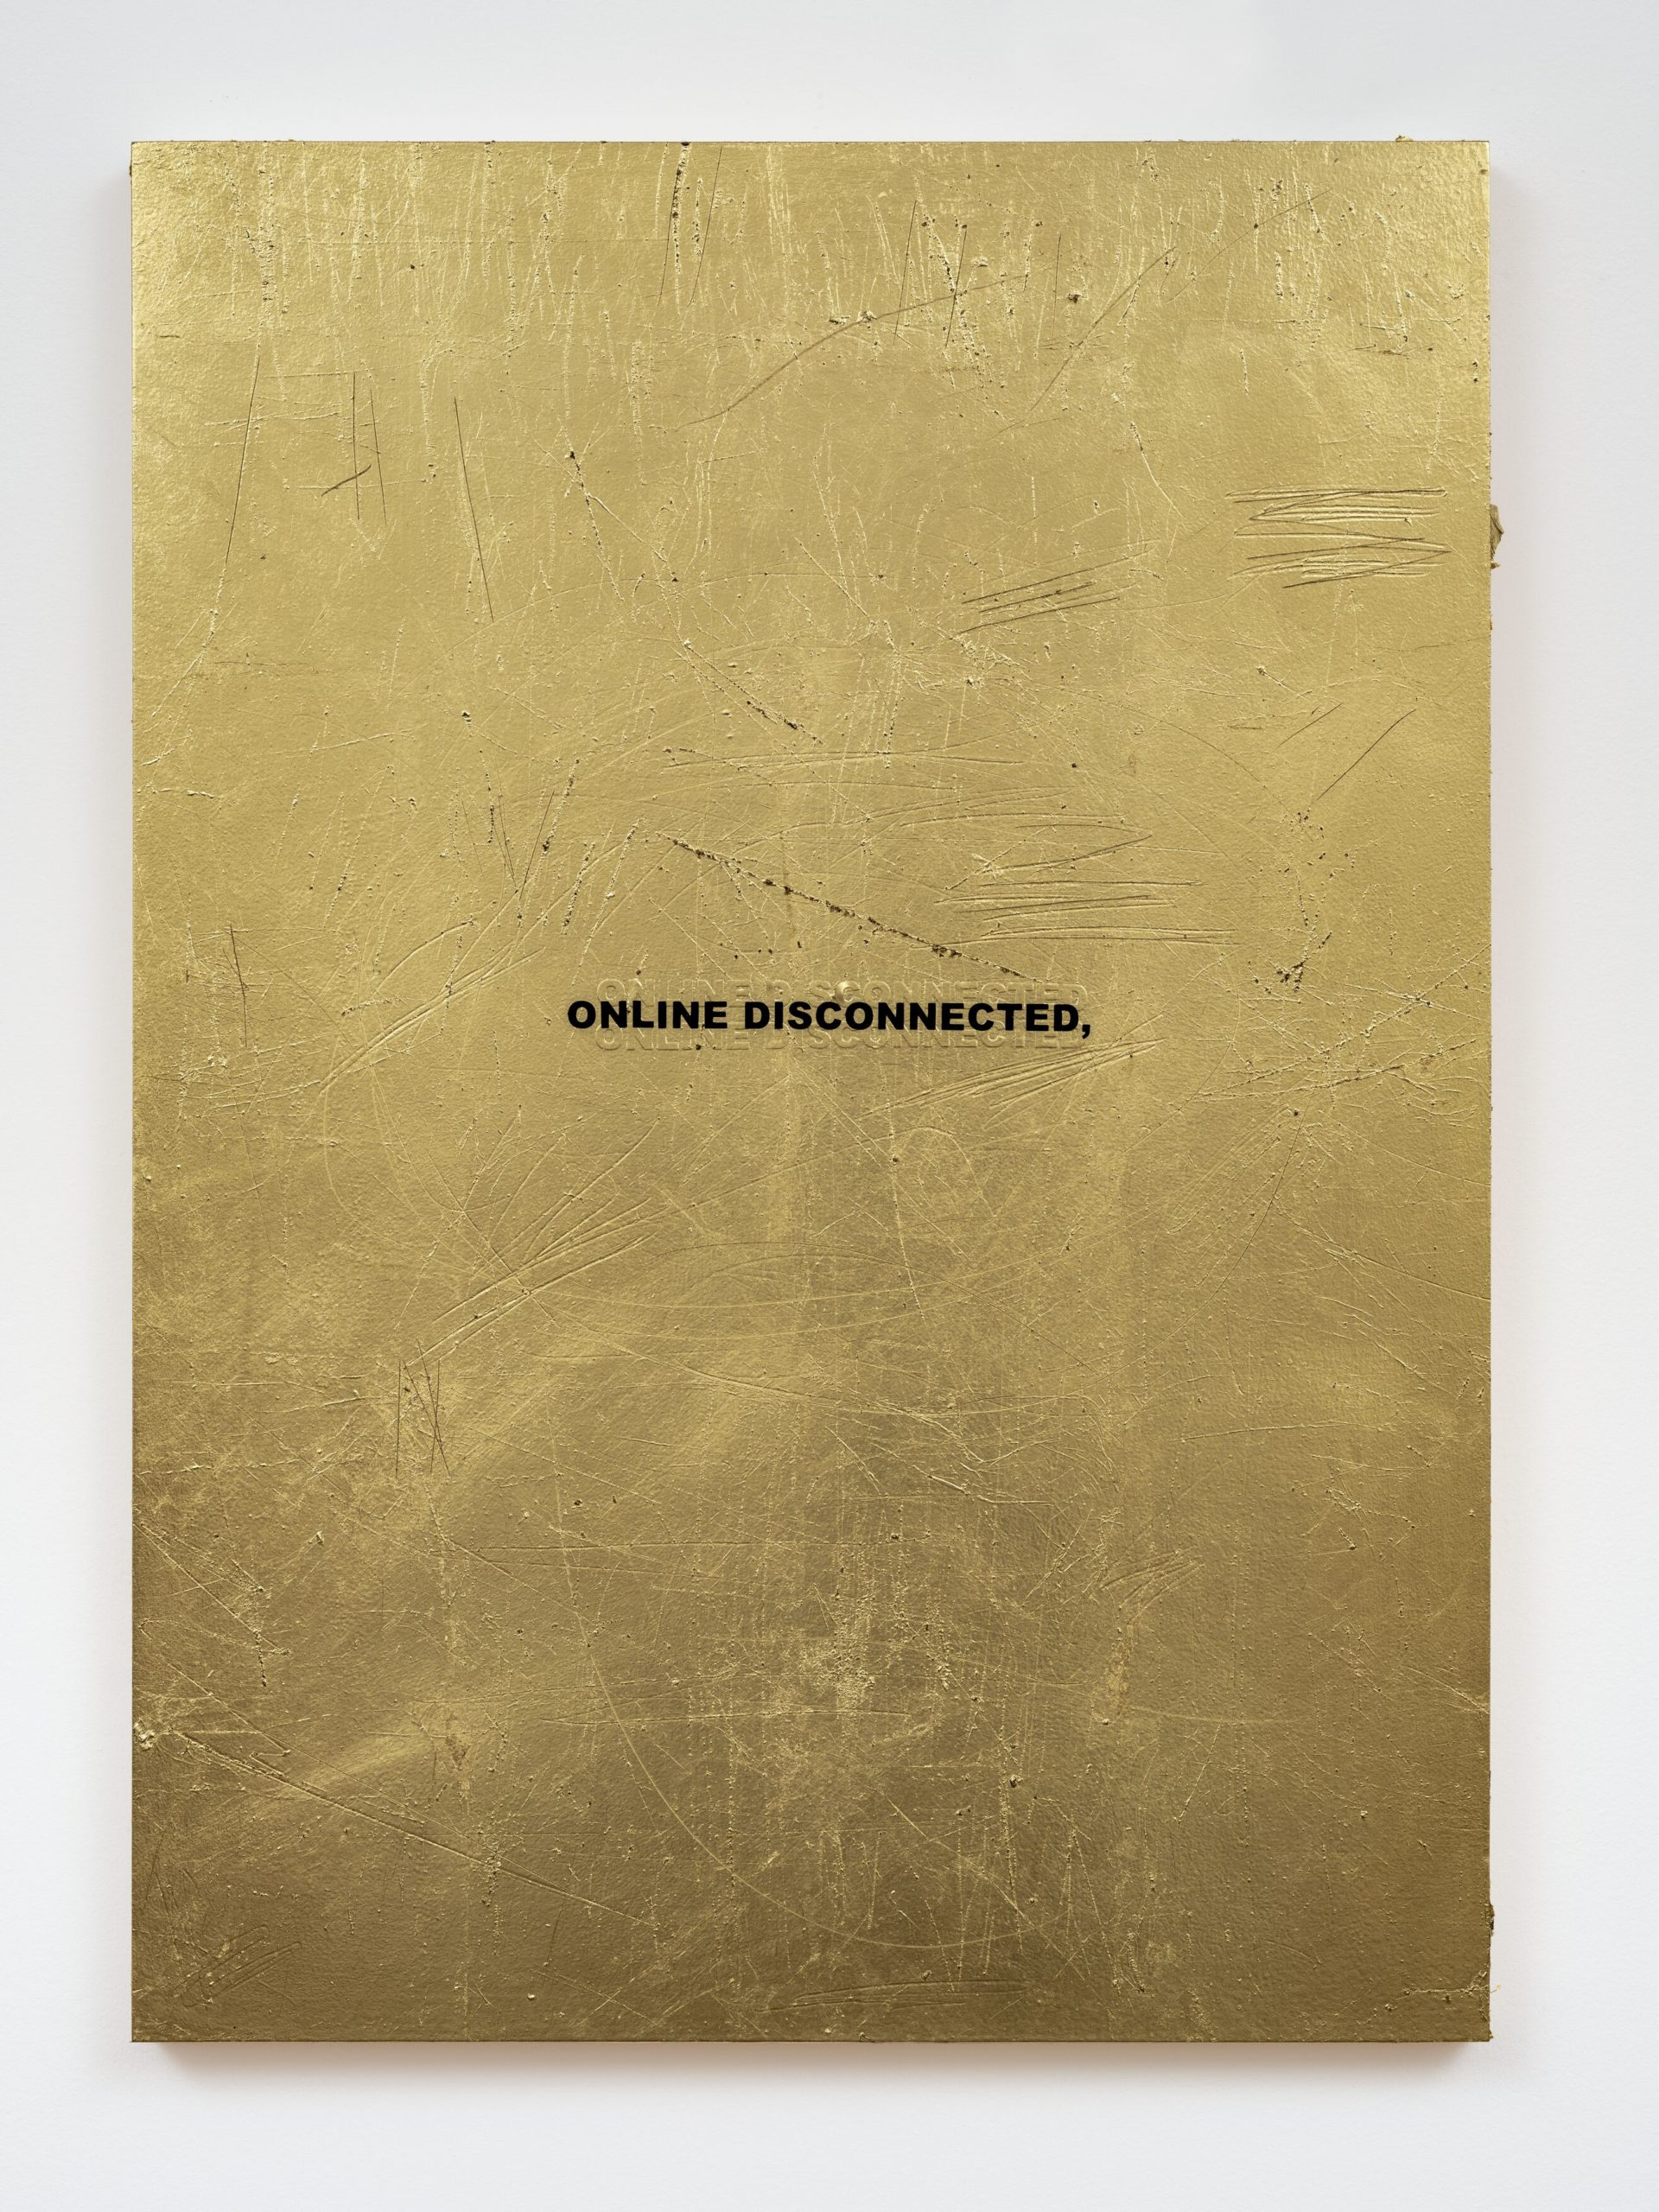 Stefan Brüggemann ONLINE DISCONNECTED (HYPER-POEM LOCKDOWN) 2020 Gold leaf and vinyl text on wood 70 x 49.7 x 3.5 cm / 27 1/2 x 19 5/8 x 1 3/8 in, © Stefan Brüggemann Courtesy the artist and Hauser & Wirth Photo: Damian Griffiths